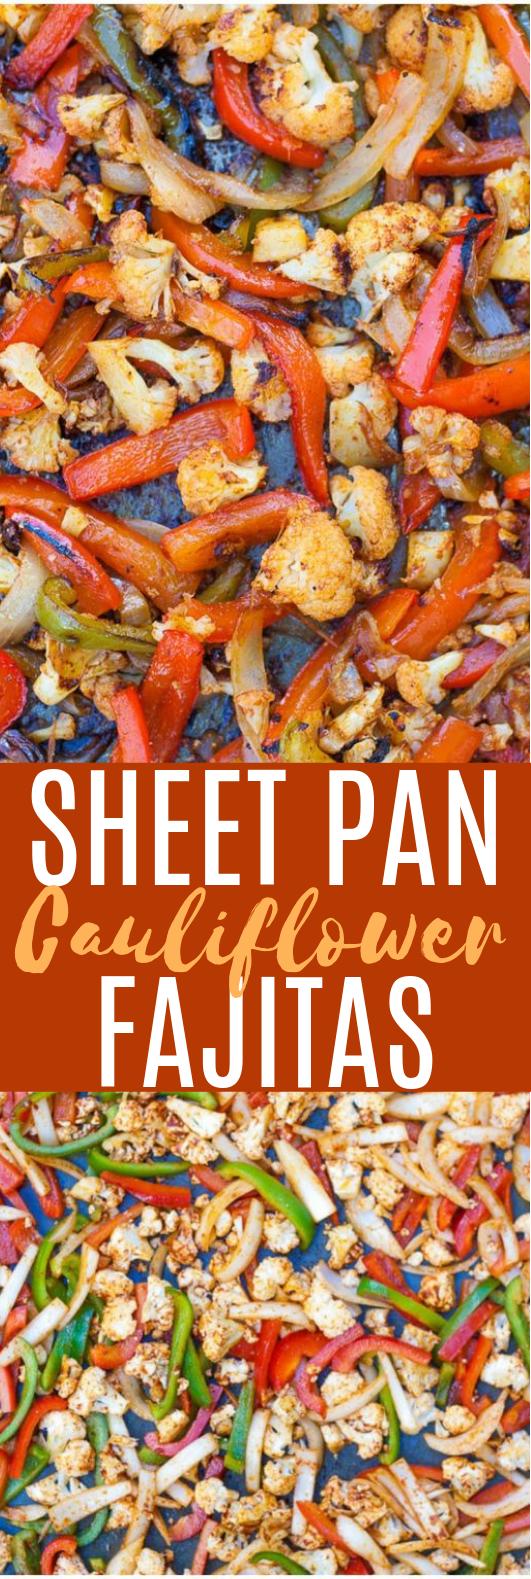 Sheet Pan Cauliflower Fajitas #vegan #cauliflower